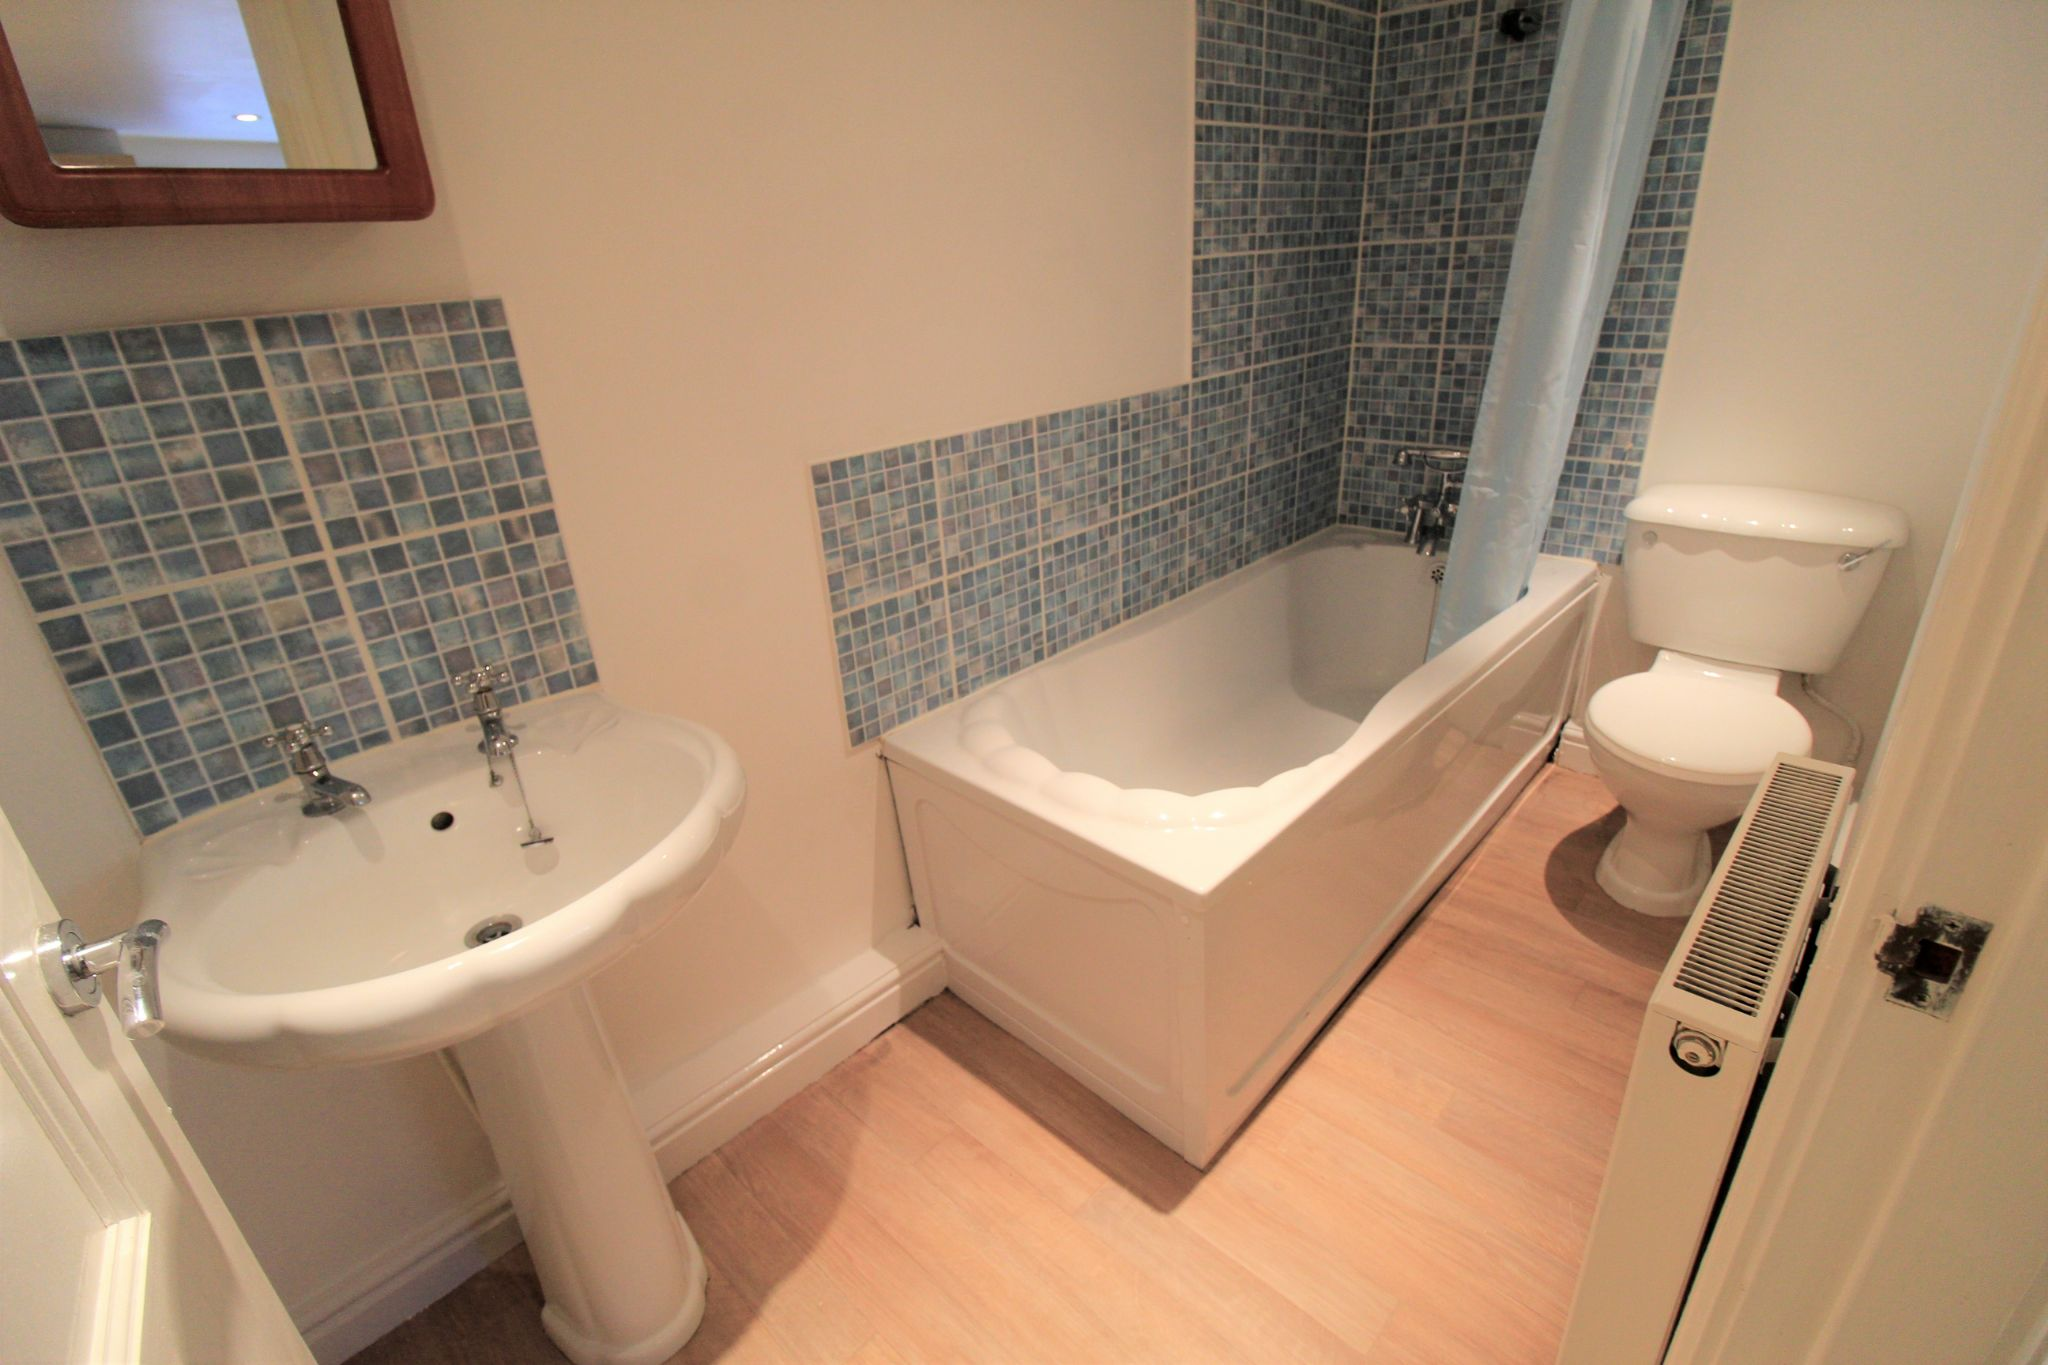 1 bedroom maisonette flat/apartment To Let in Huddersfield - Bathroom